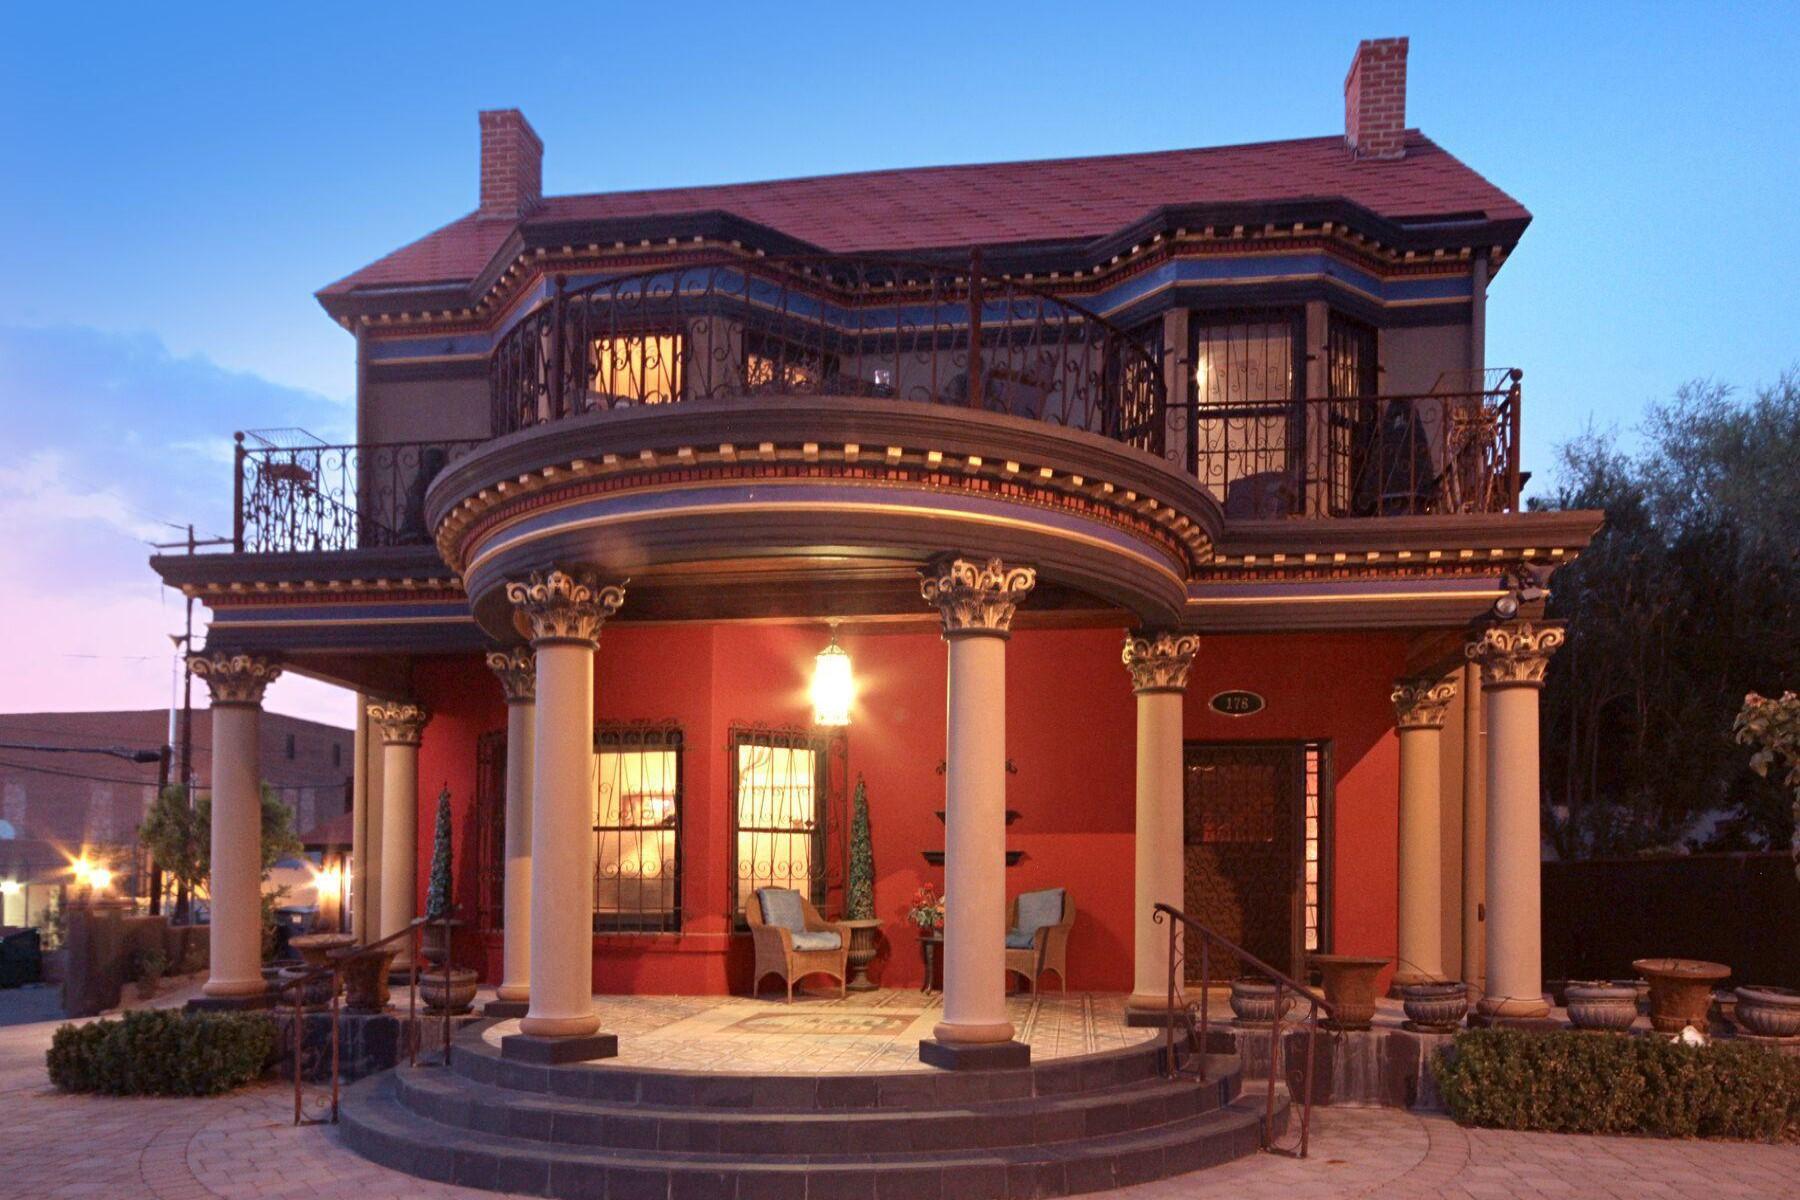 Casa Unifamiliar por un Venta en The Rubi Mansion 175 E 12th Street Tucson, Arizona, 85701 Estados Unidos